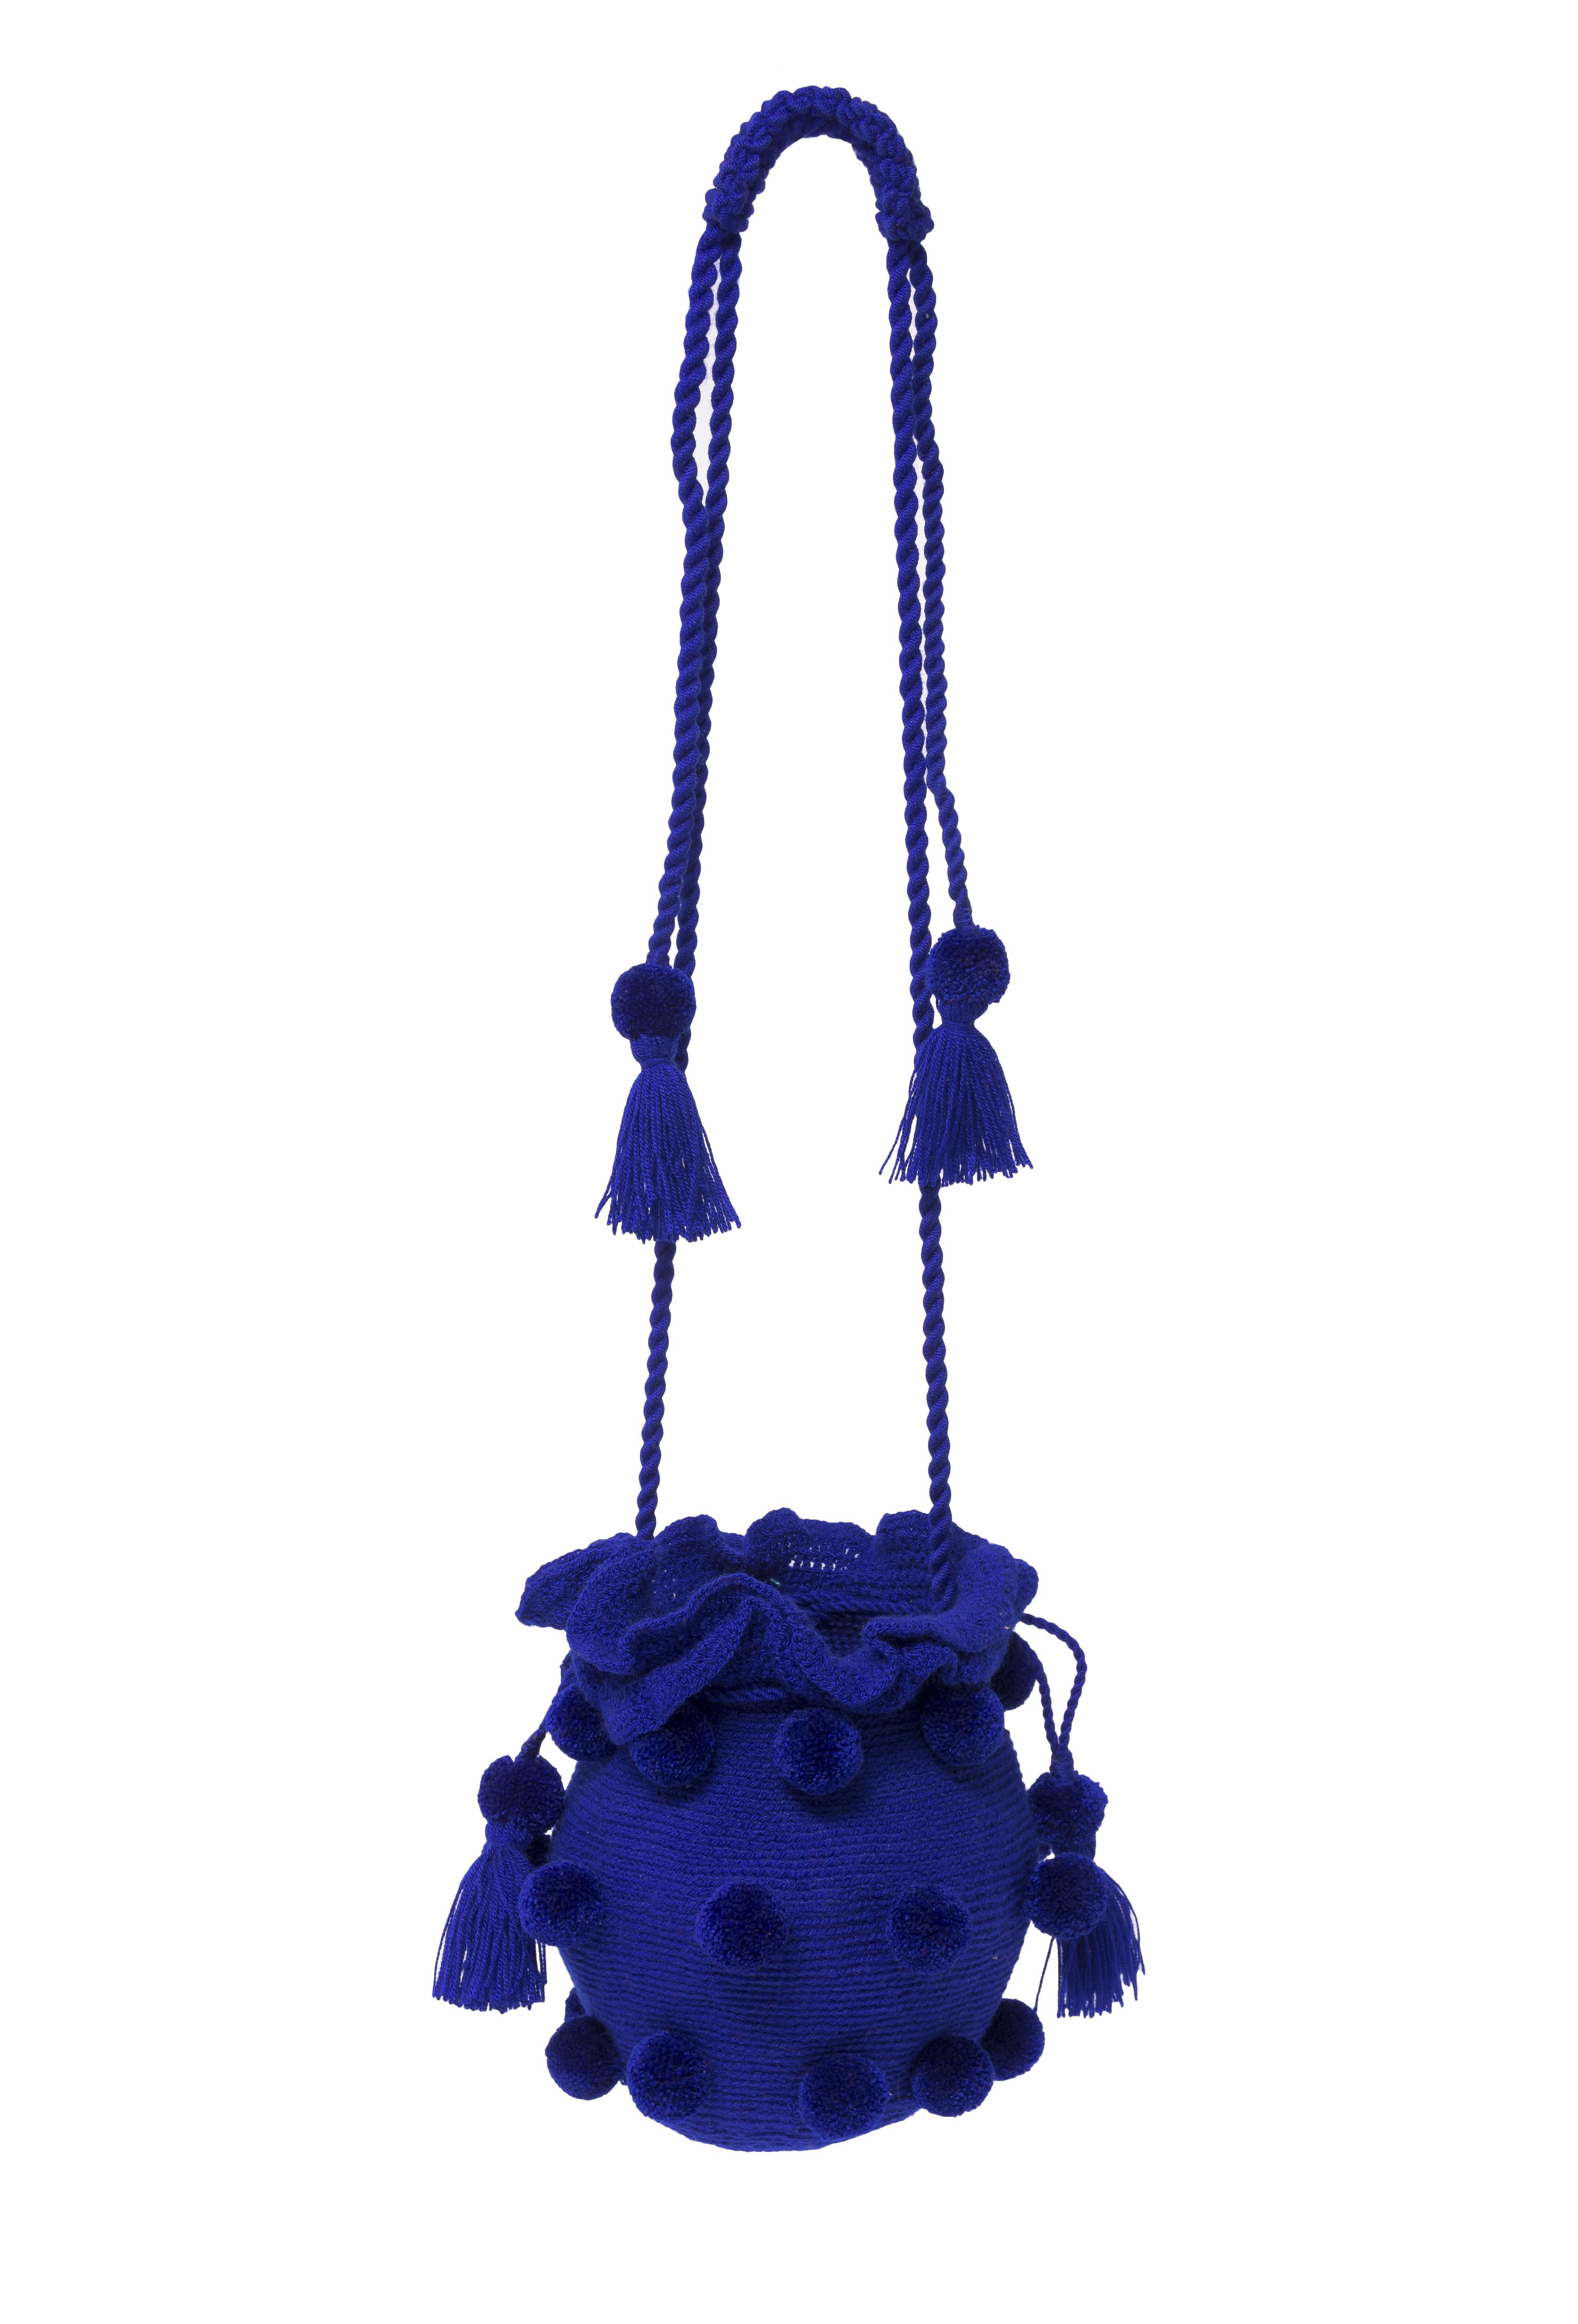 Mochila La guapa xl- azul rey